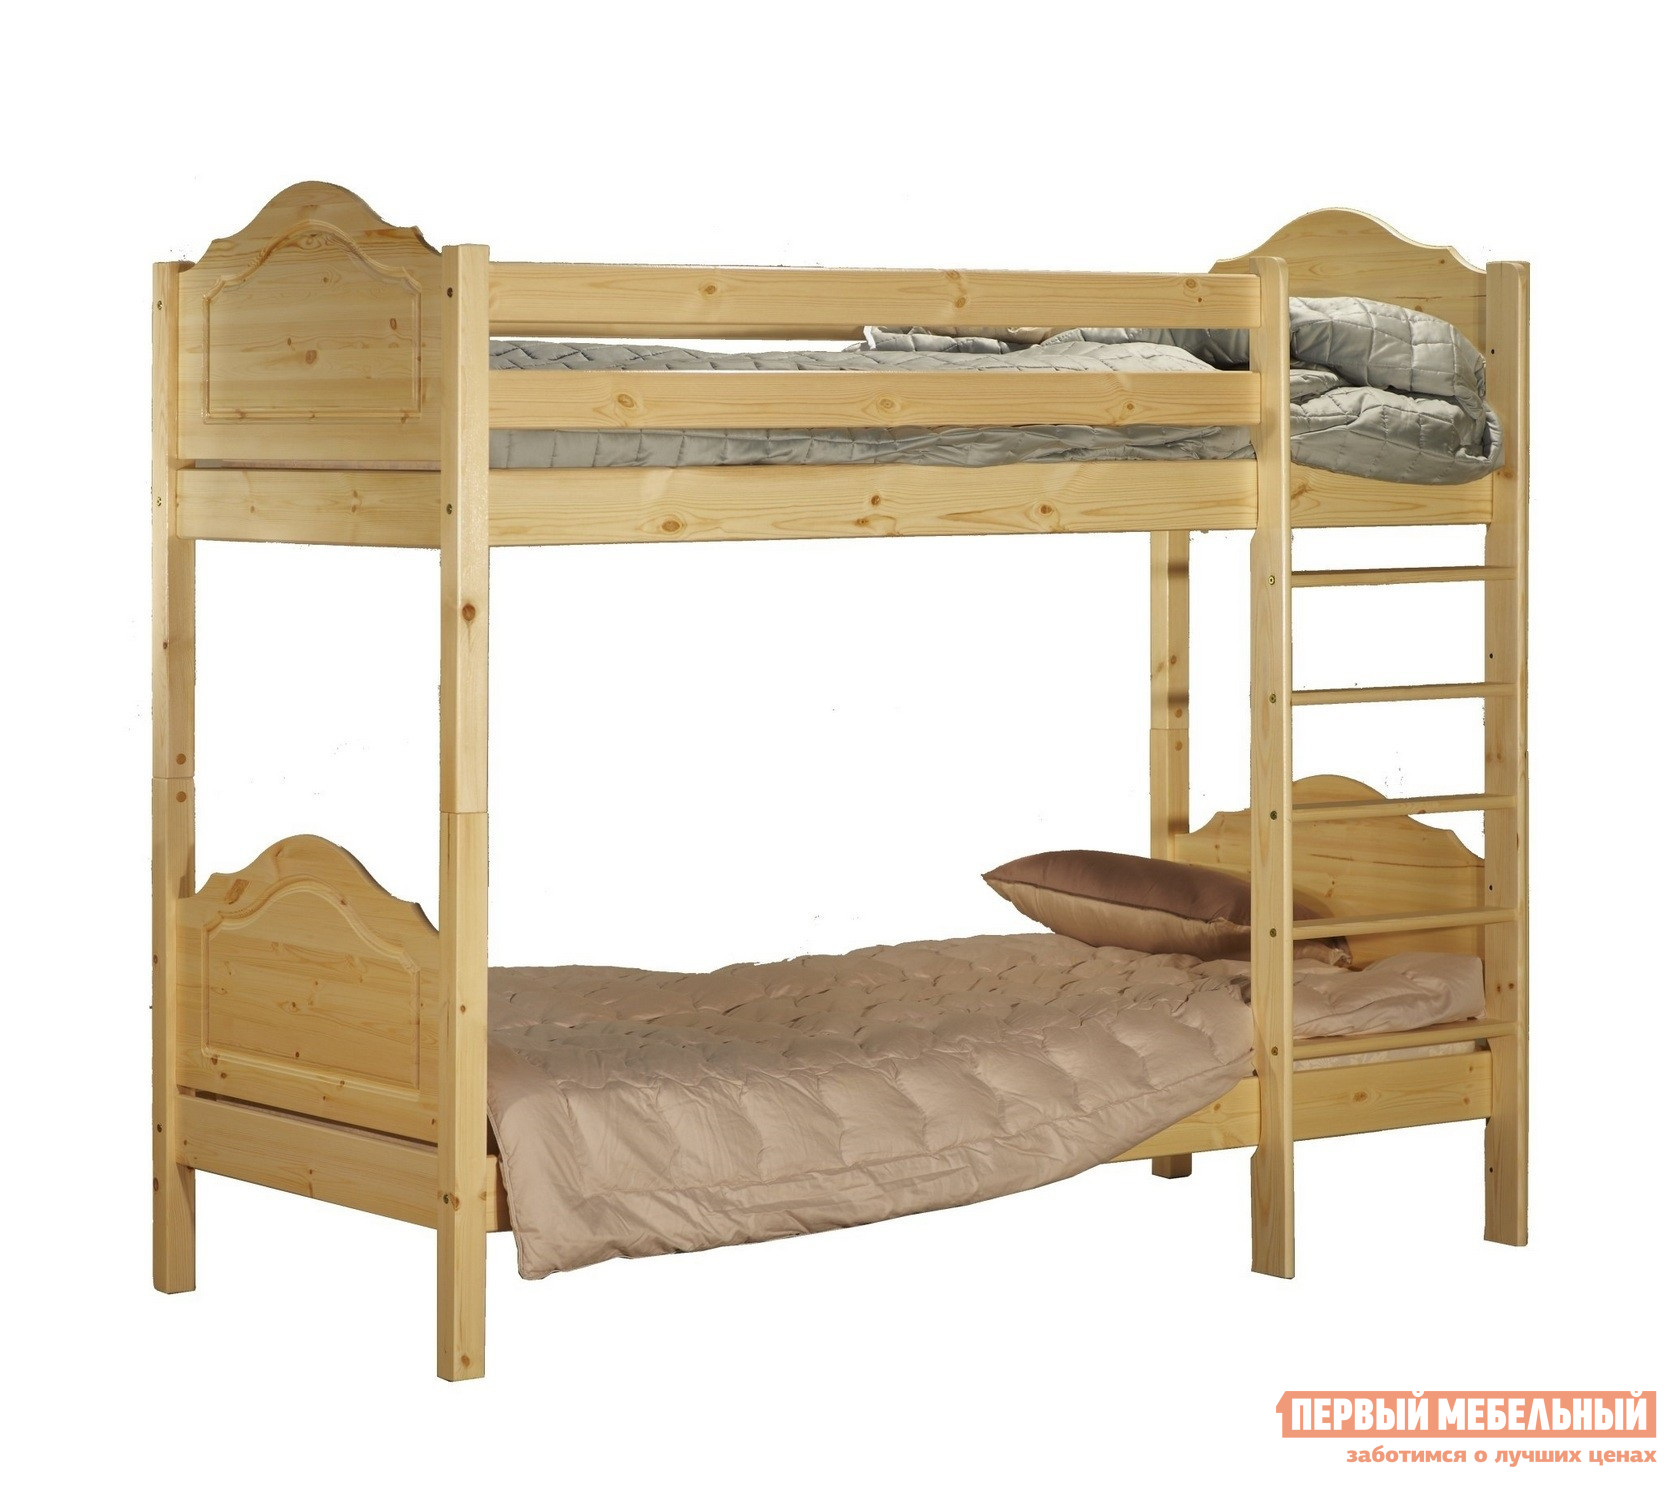 Двухъярусная кровать Timberica Кровать 2-ярусная Кая (K2) двухъярусная кровать для детей впк кровать 2 х ярусная polini kids simple 5000